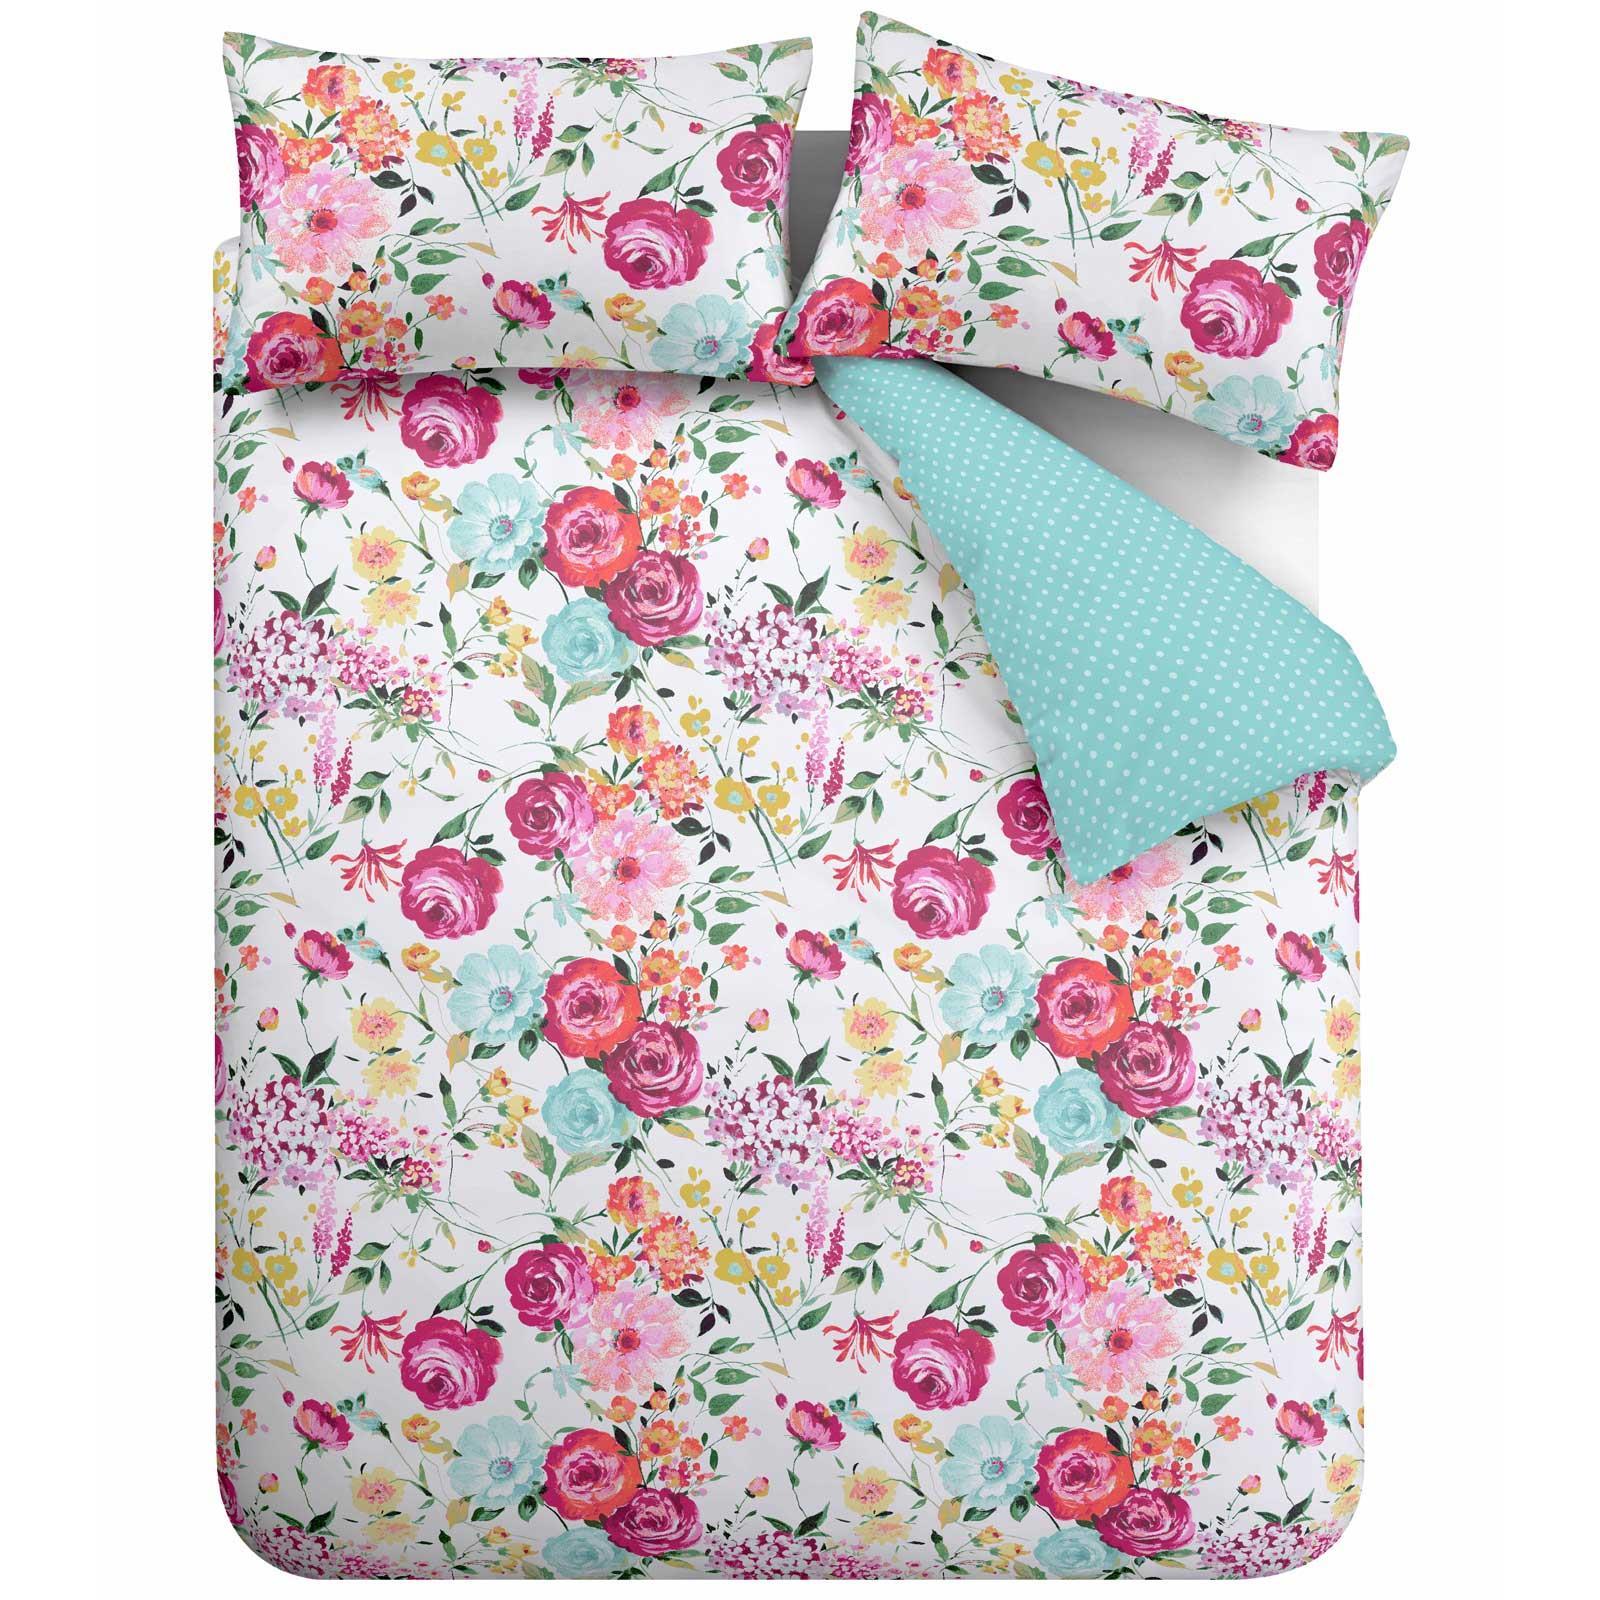 Catherine-Lansfield-Salisbury-Pink-cubierta-del-edredon-edredon-cubre-floral-de-conjuntos-de-cama miniatura 10